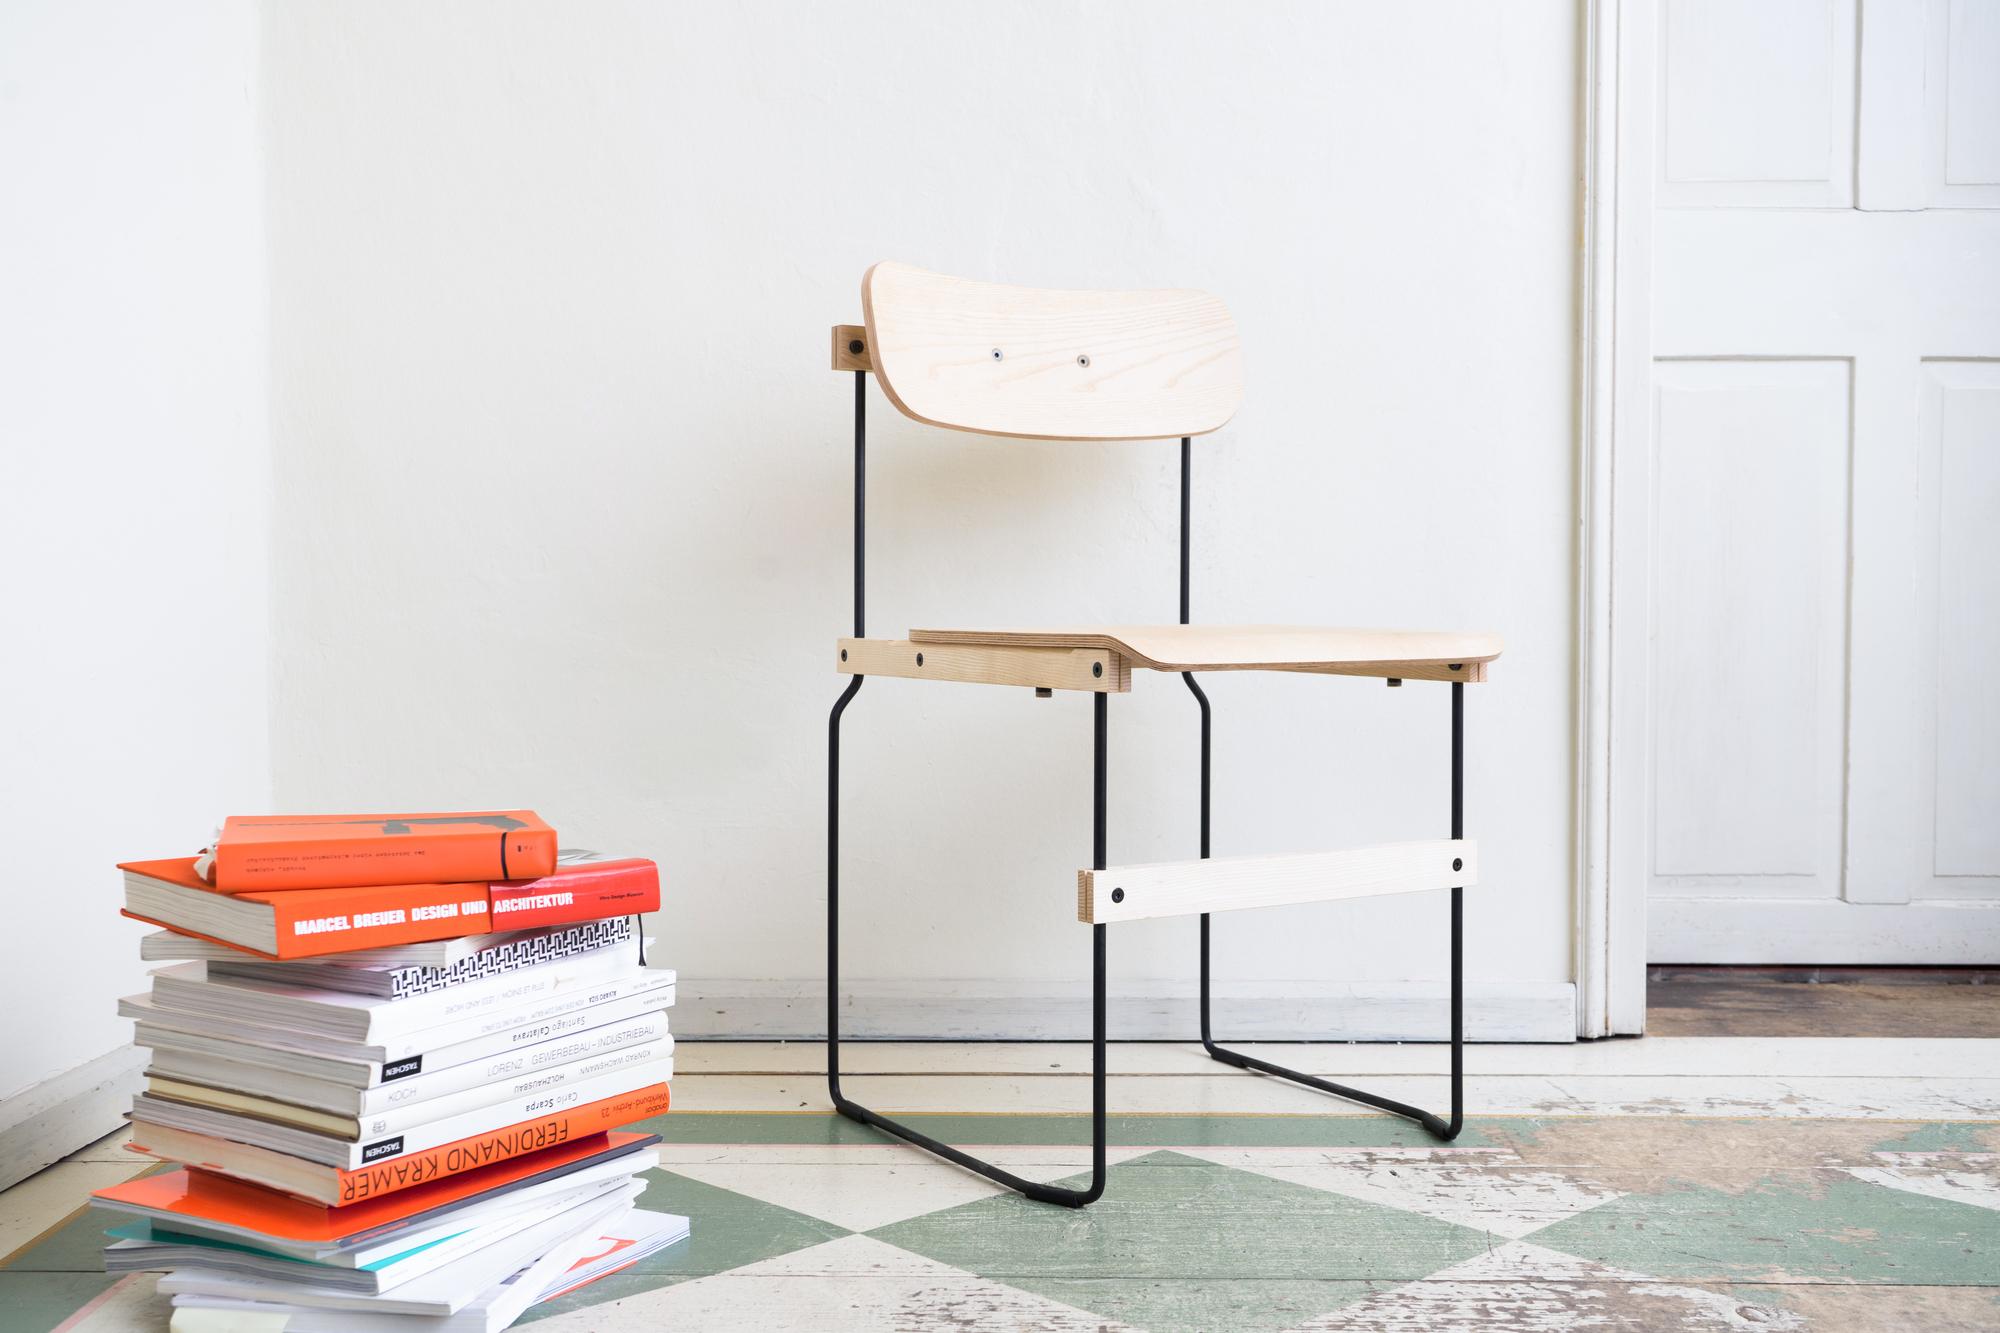 Bruto Stuhl ohne Armlehne Nils Holger Moormann